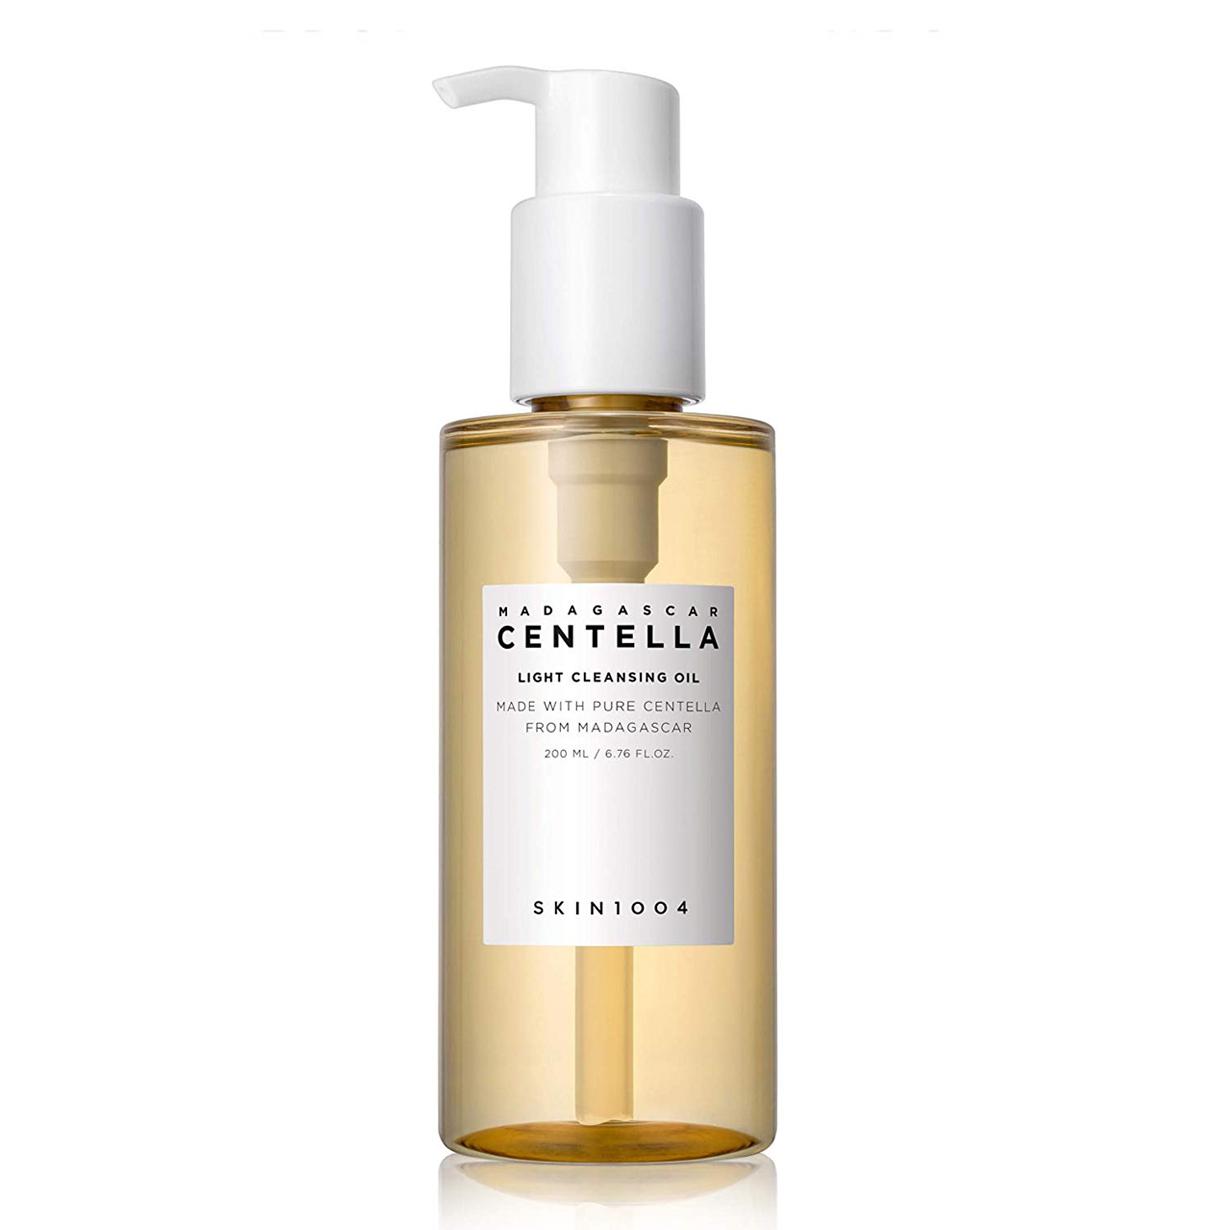 dau-tay-trang-skin1004-madagascar-centella-light-cleansing-oil-orchard.vn-7